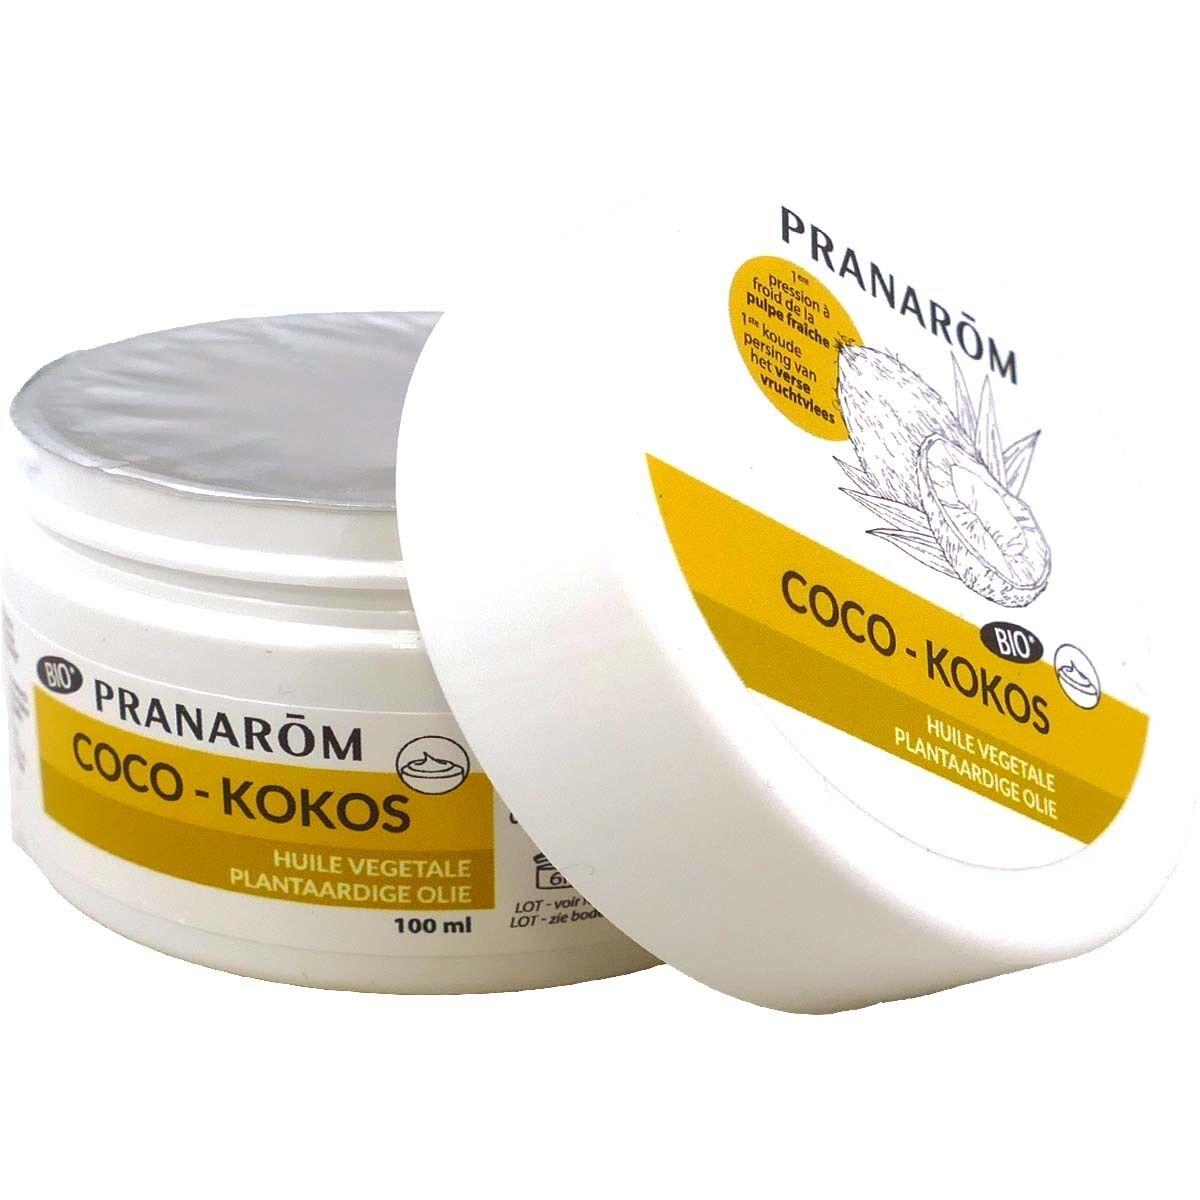 Pranarom coco-kokos huile vegetale bio 100 ml